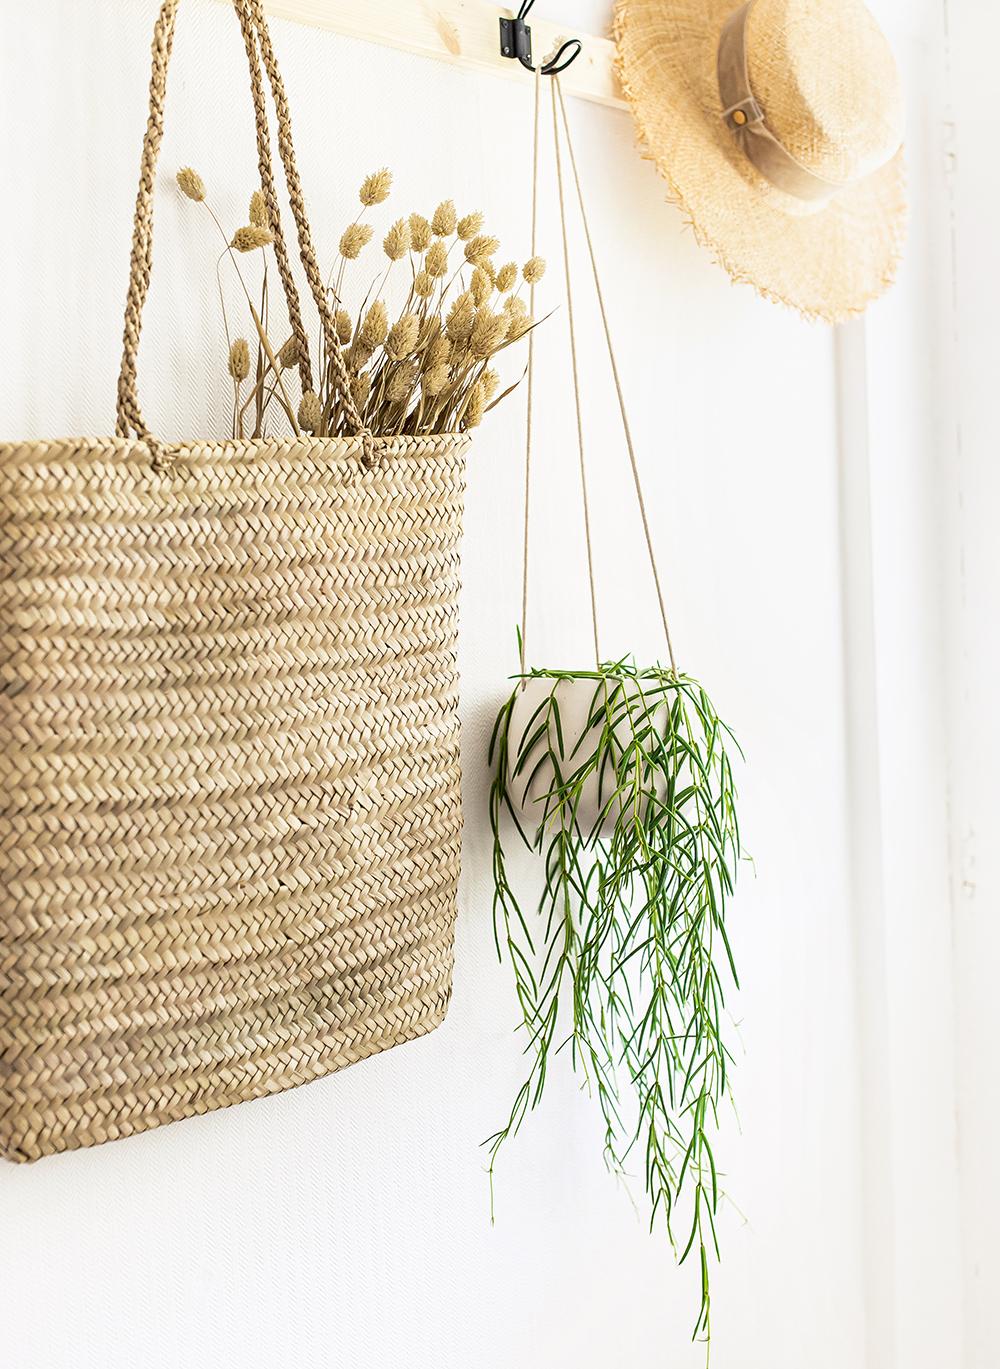 Hanging-Wax-Plant-Linear-Hoya--kelseyinlondon-homewithkelsey-plant-guide-best-indoor-plants